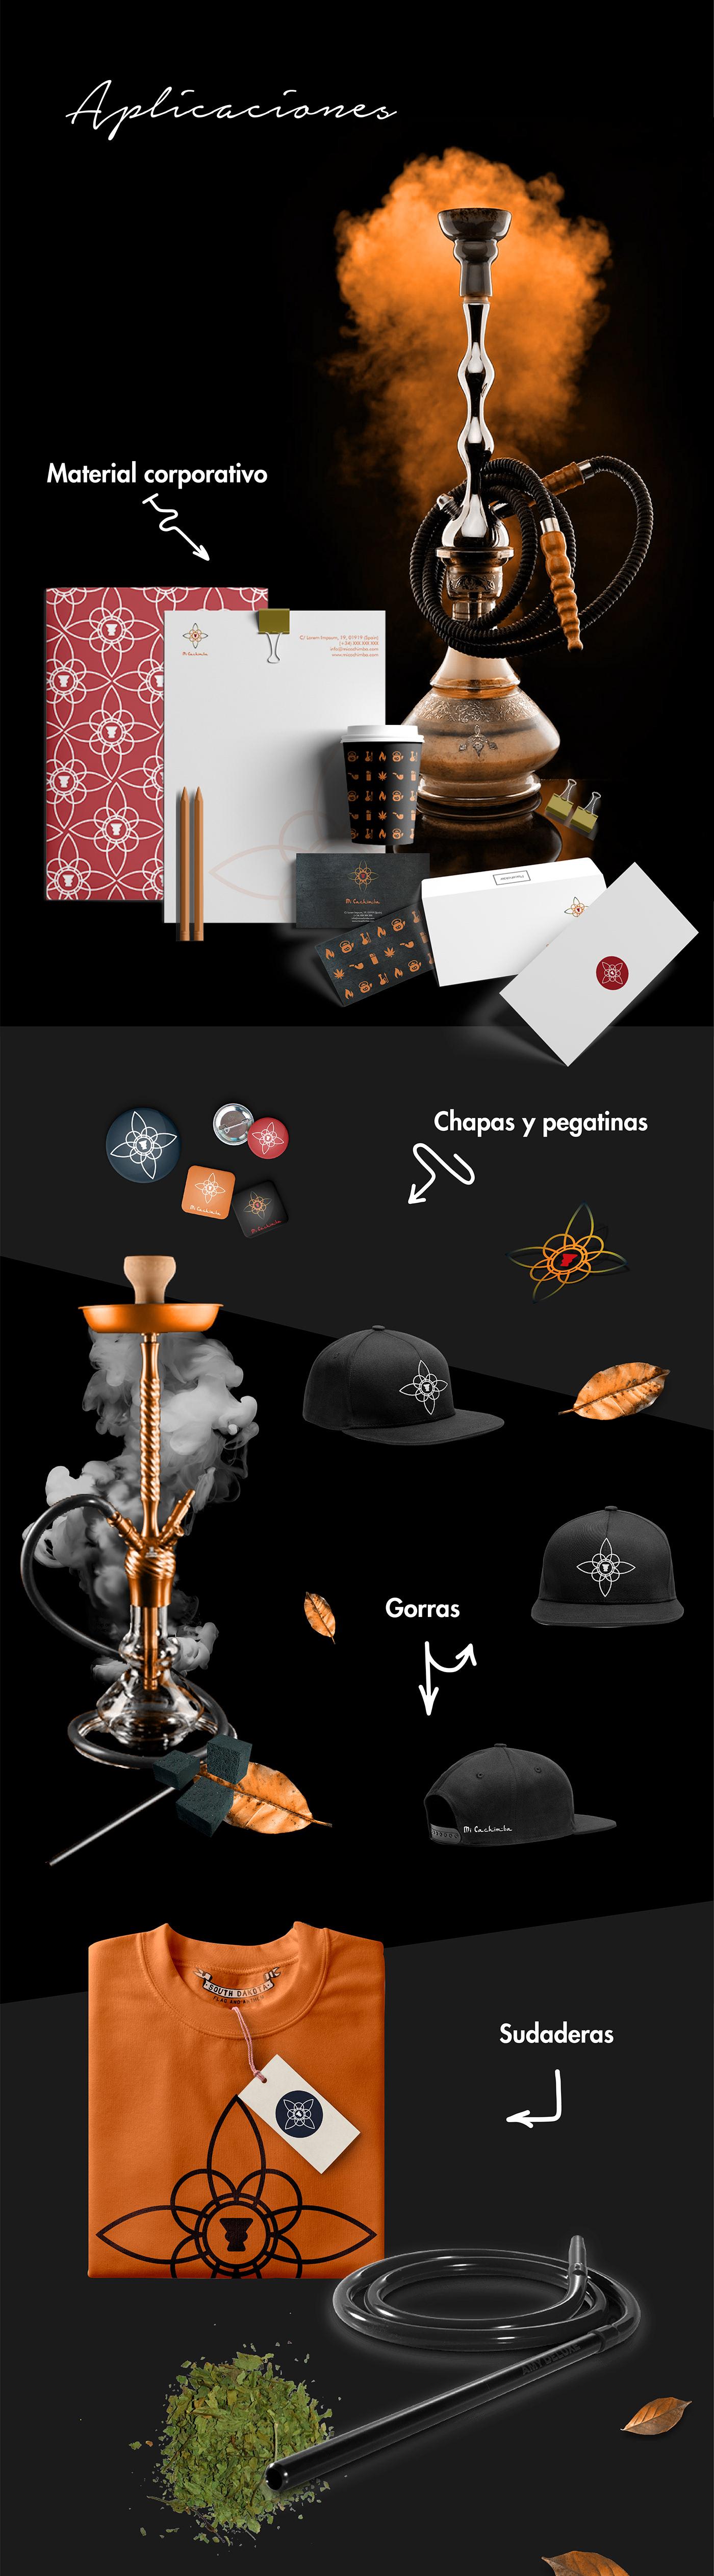 branding  brand identity cachimbas hookah Identidad de marca micachimba logo animation logo animation